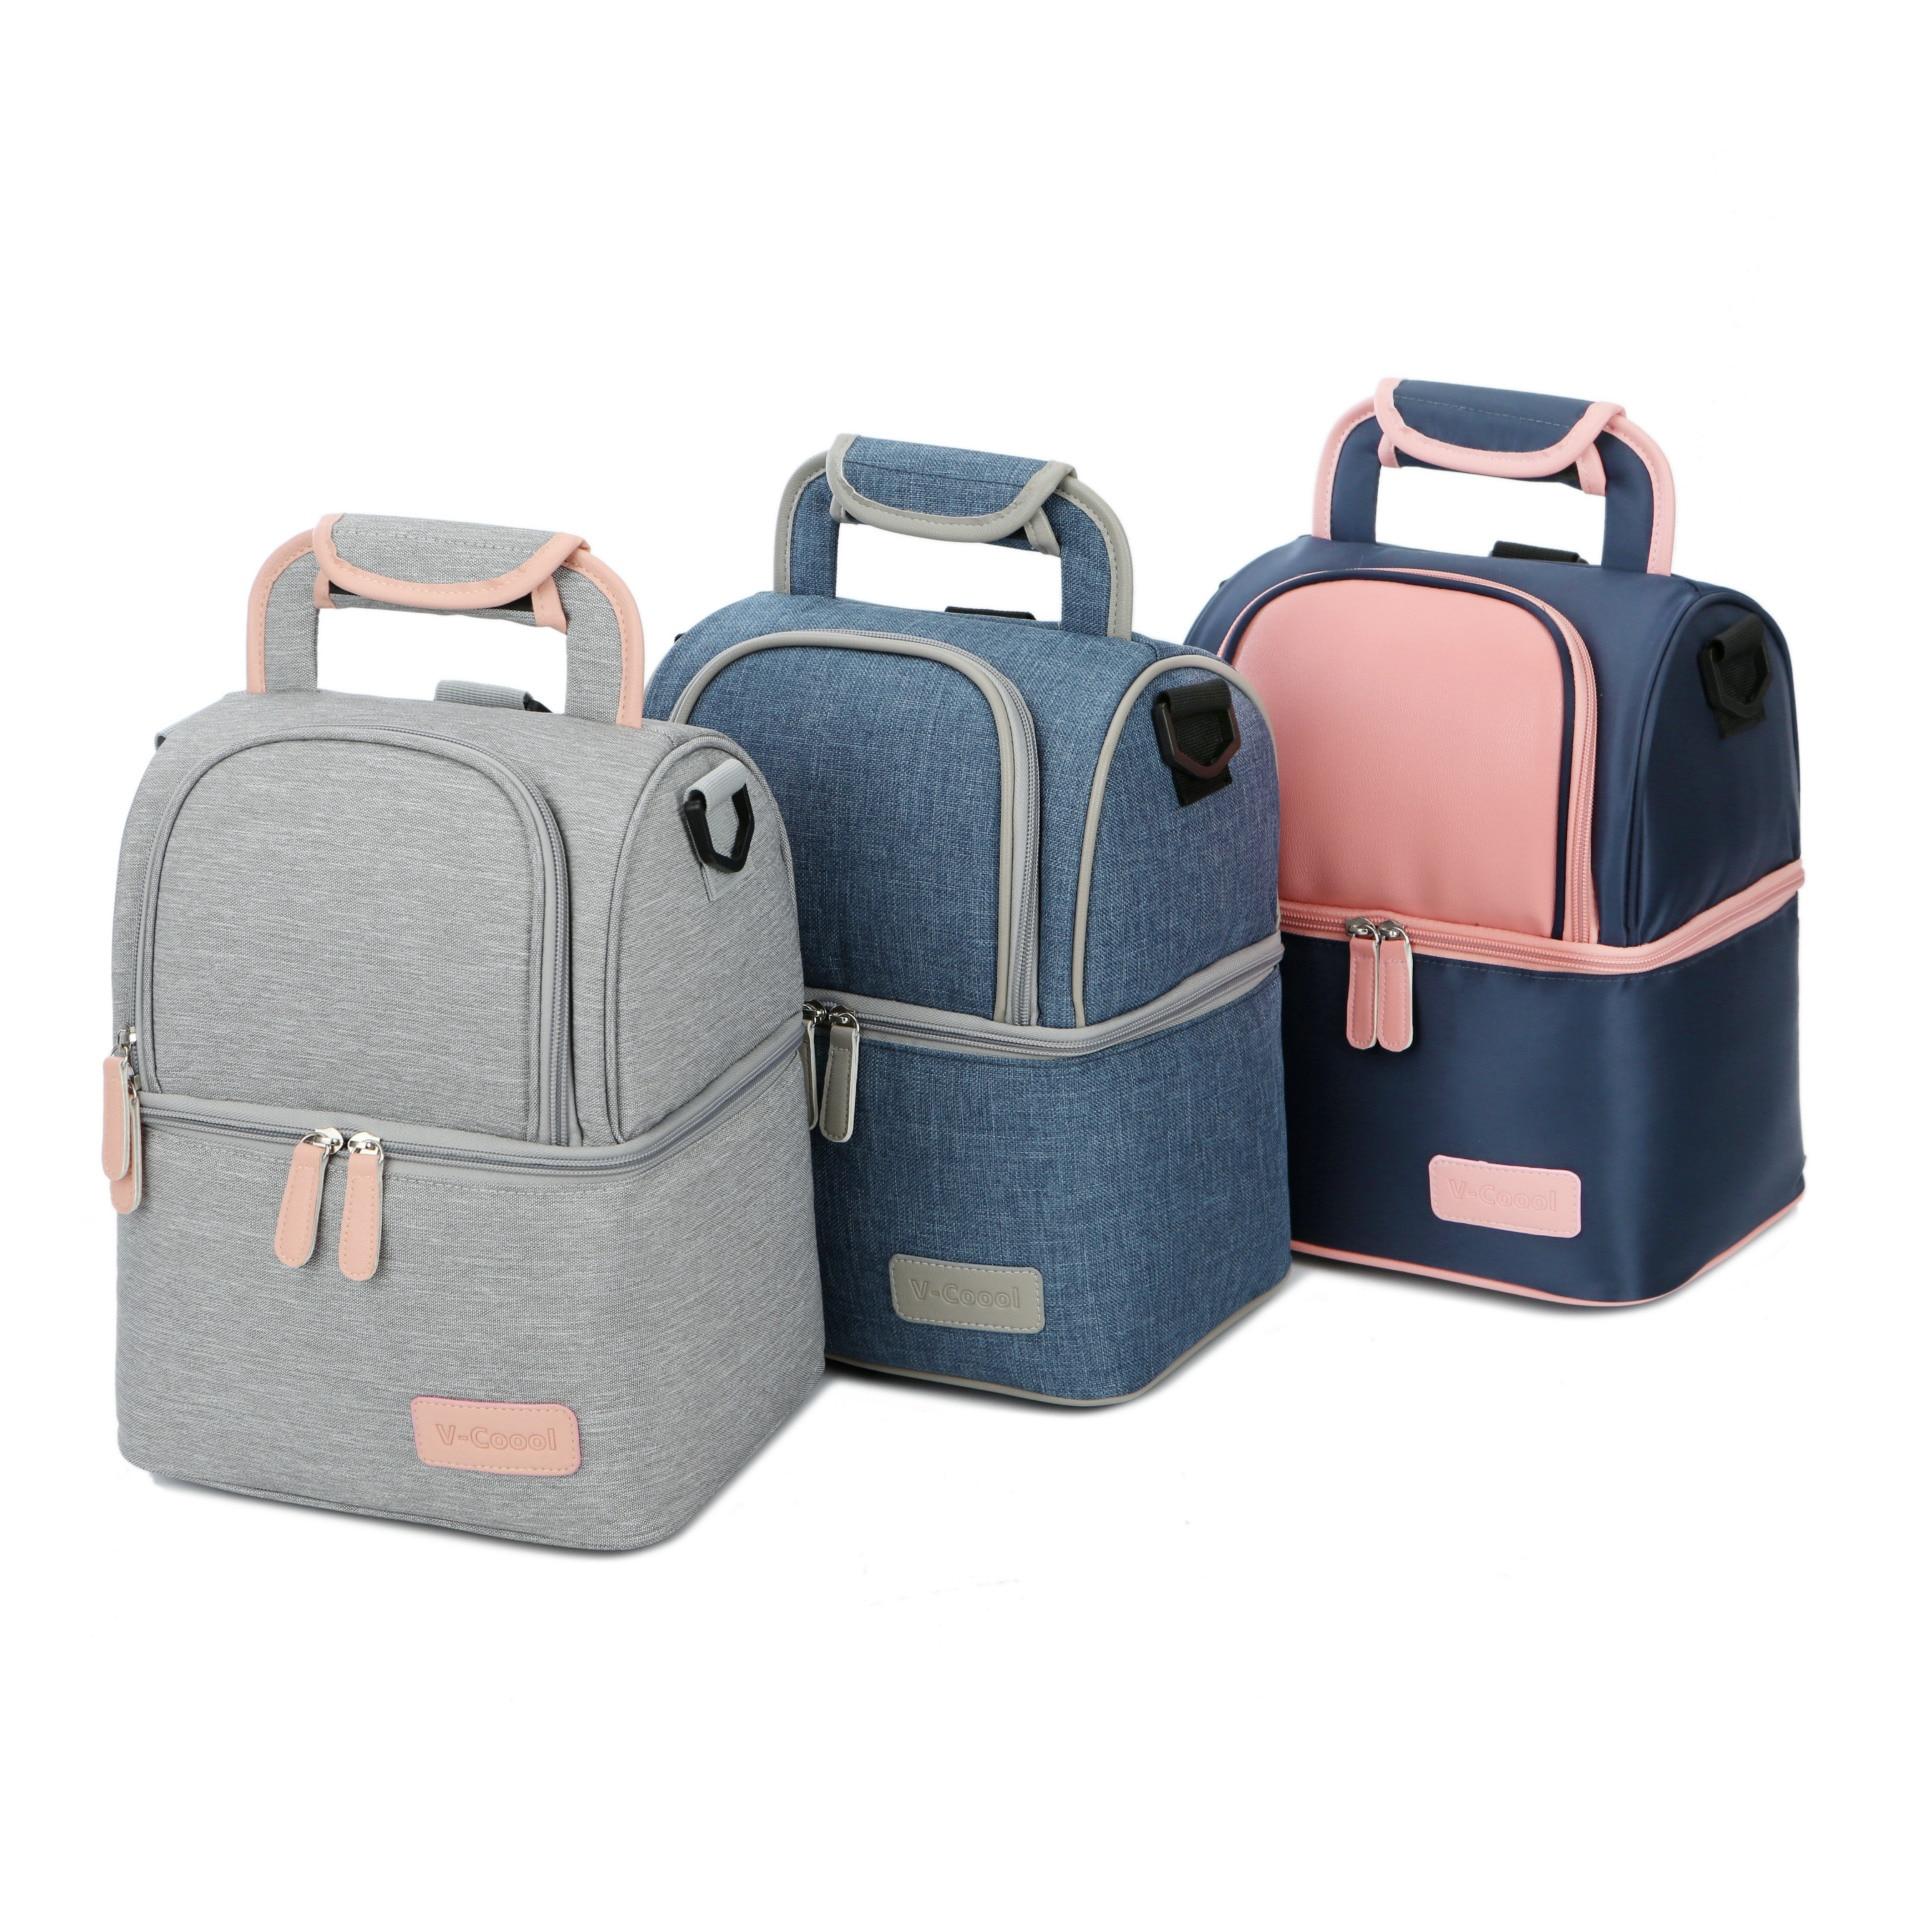 Double Layer Fashion Diaper Bag Backpack Mom Maternity Messengers Nappy Multipurpose Bolsa Maternidad Milk Bottle Bags 2017DBE